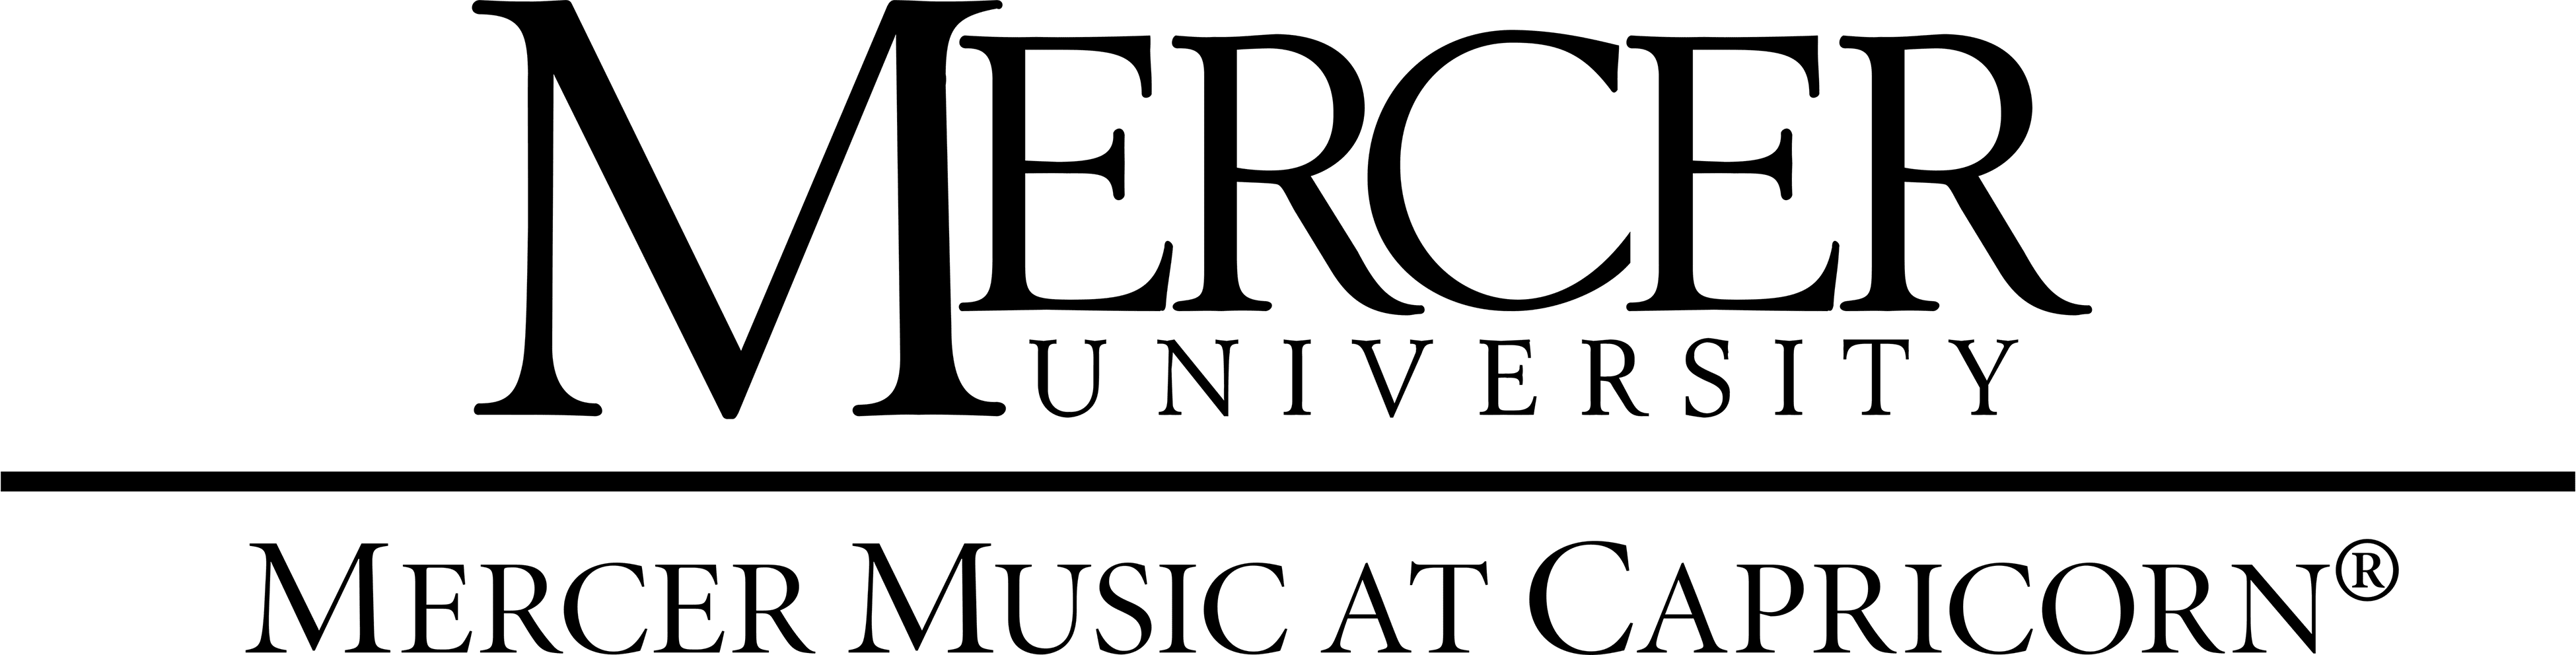 MercerMusicatCapricorn